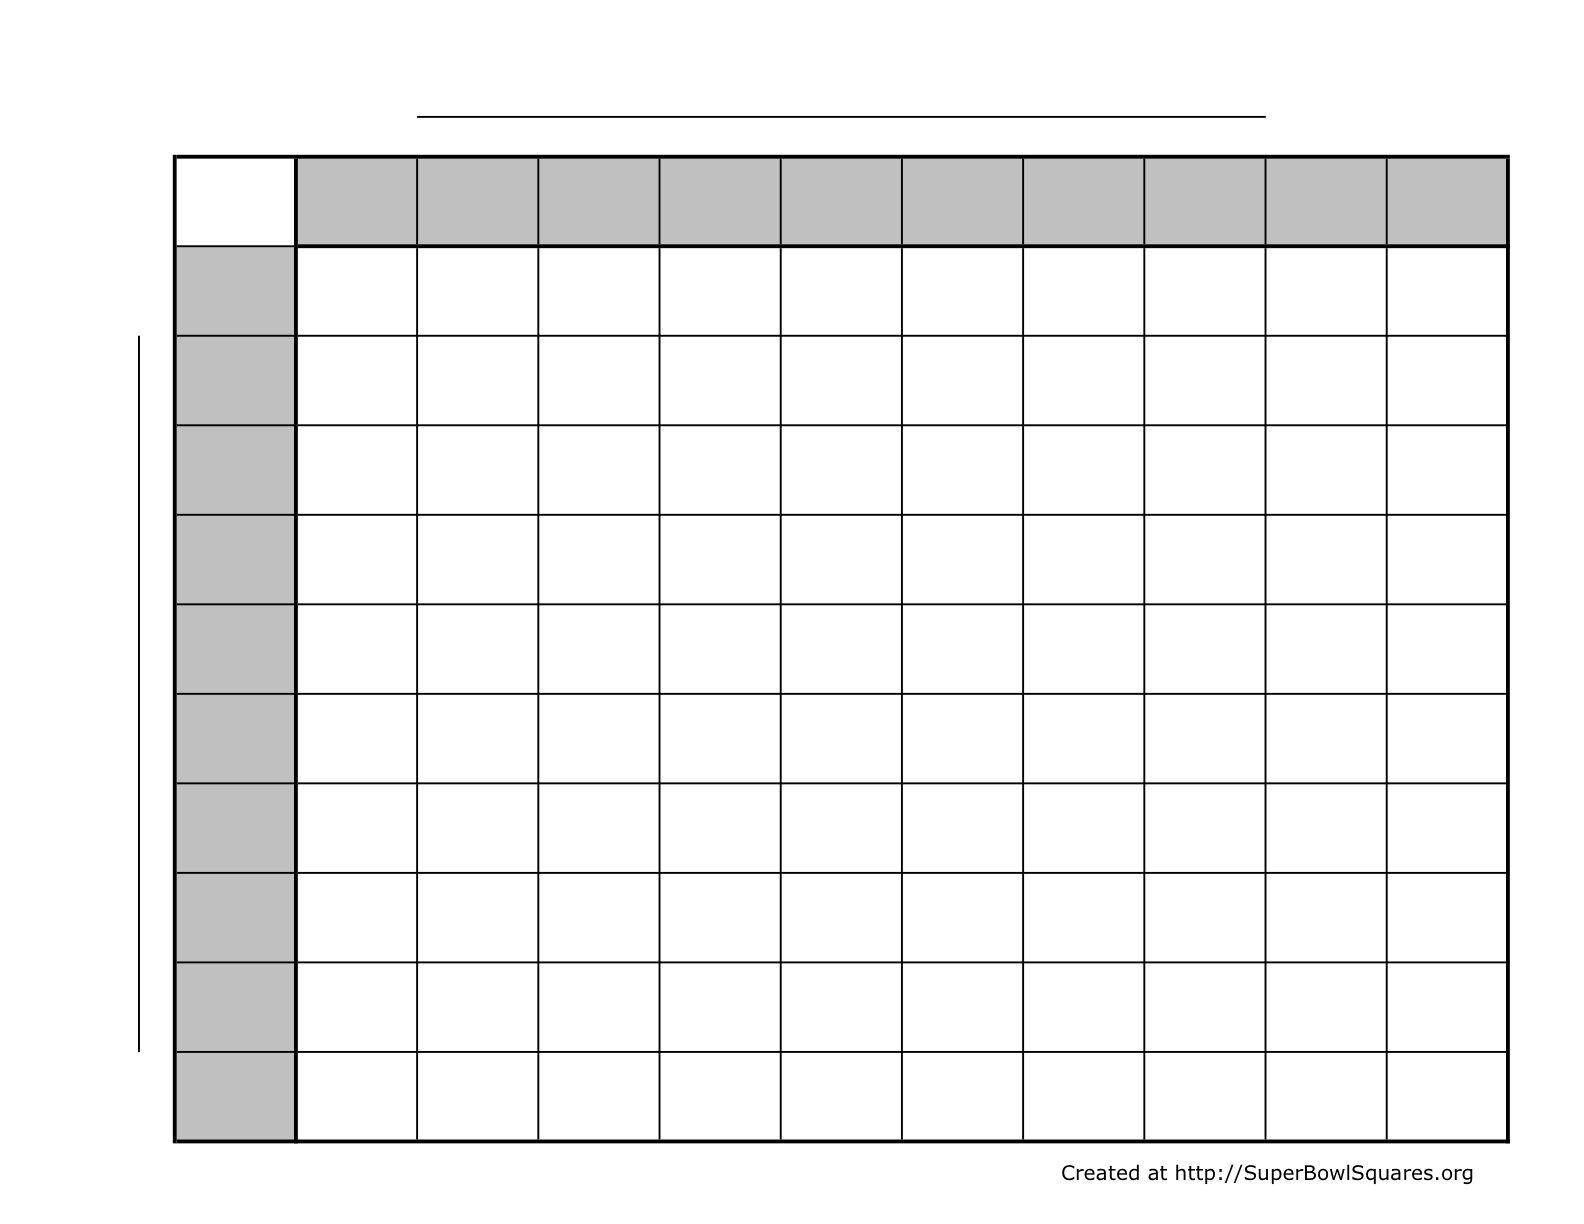 Free Printable Super Bowl Squares Template in 2020